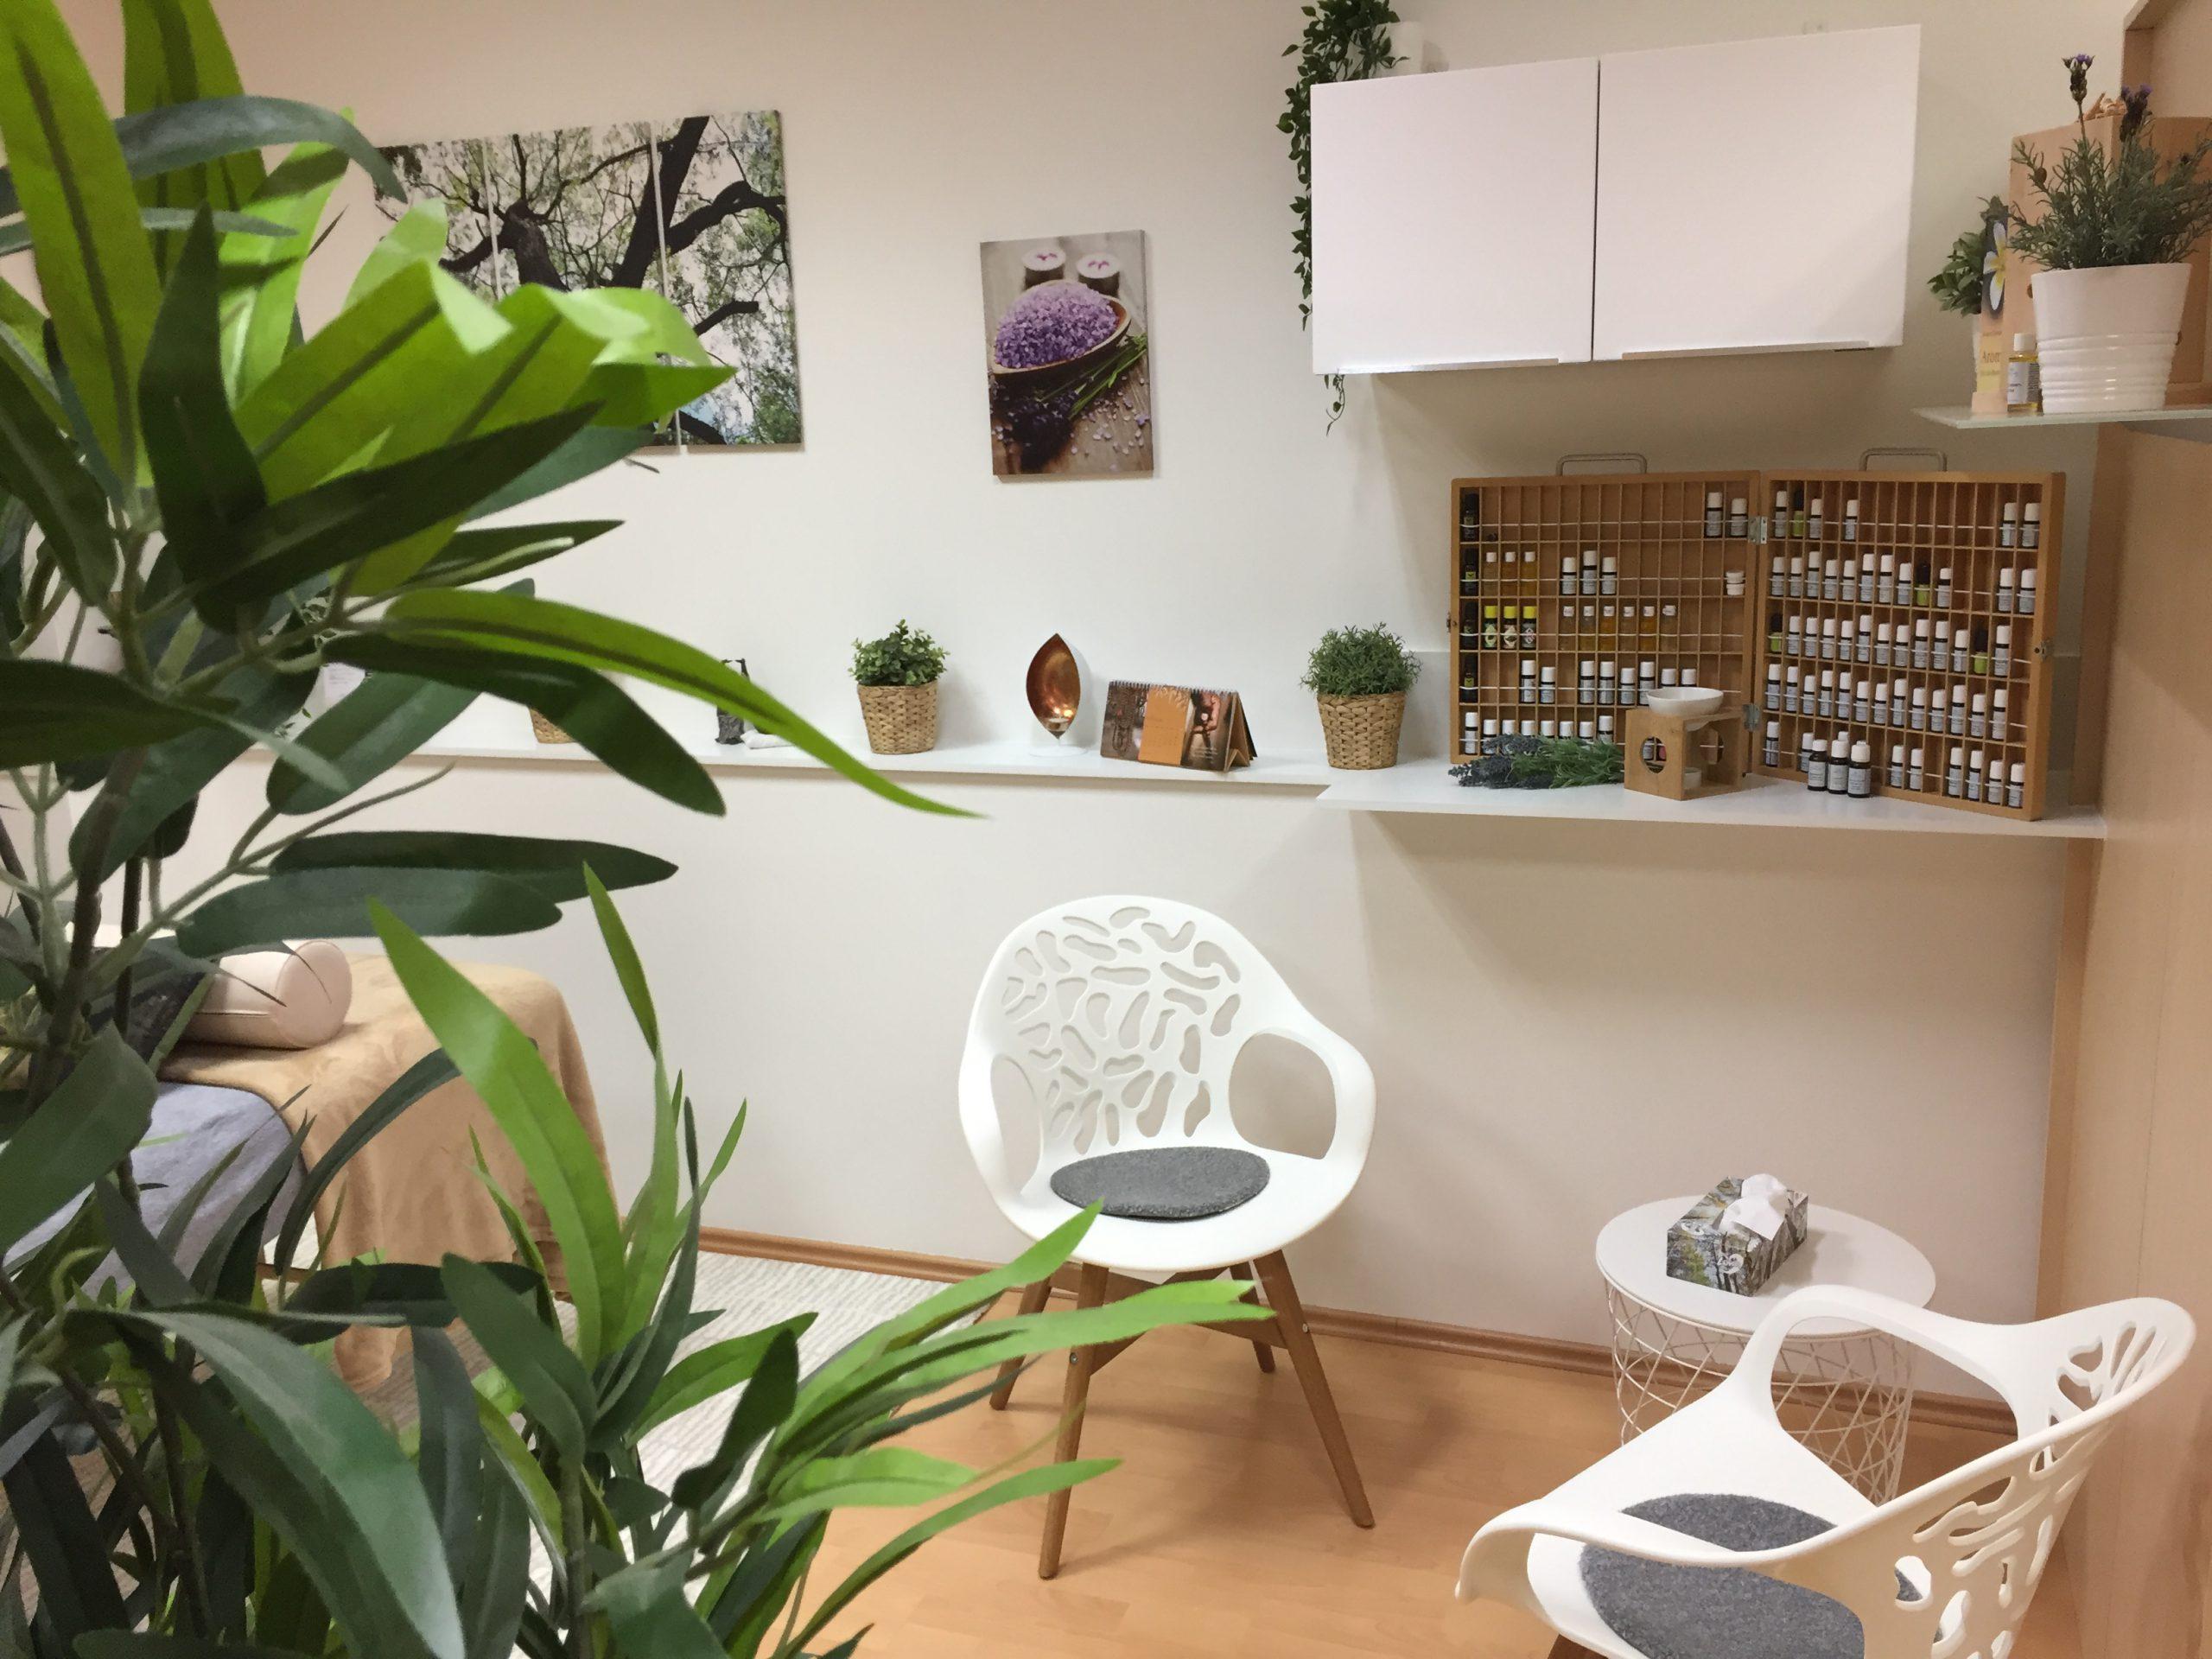 praxis entero bietet Energie-Balancing und Aromatherapie an